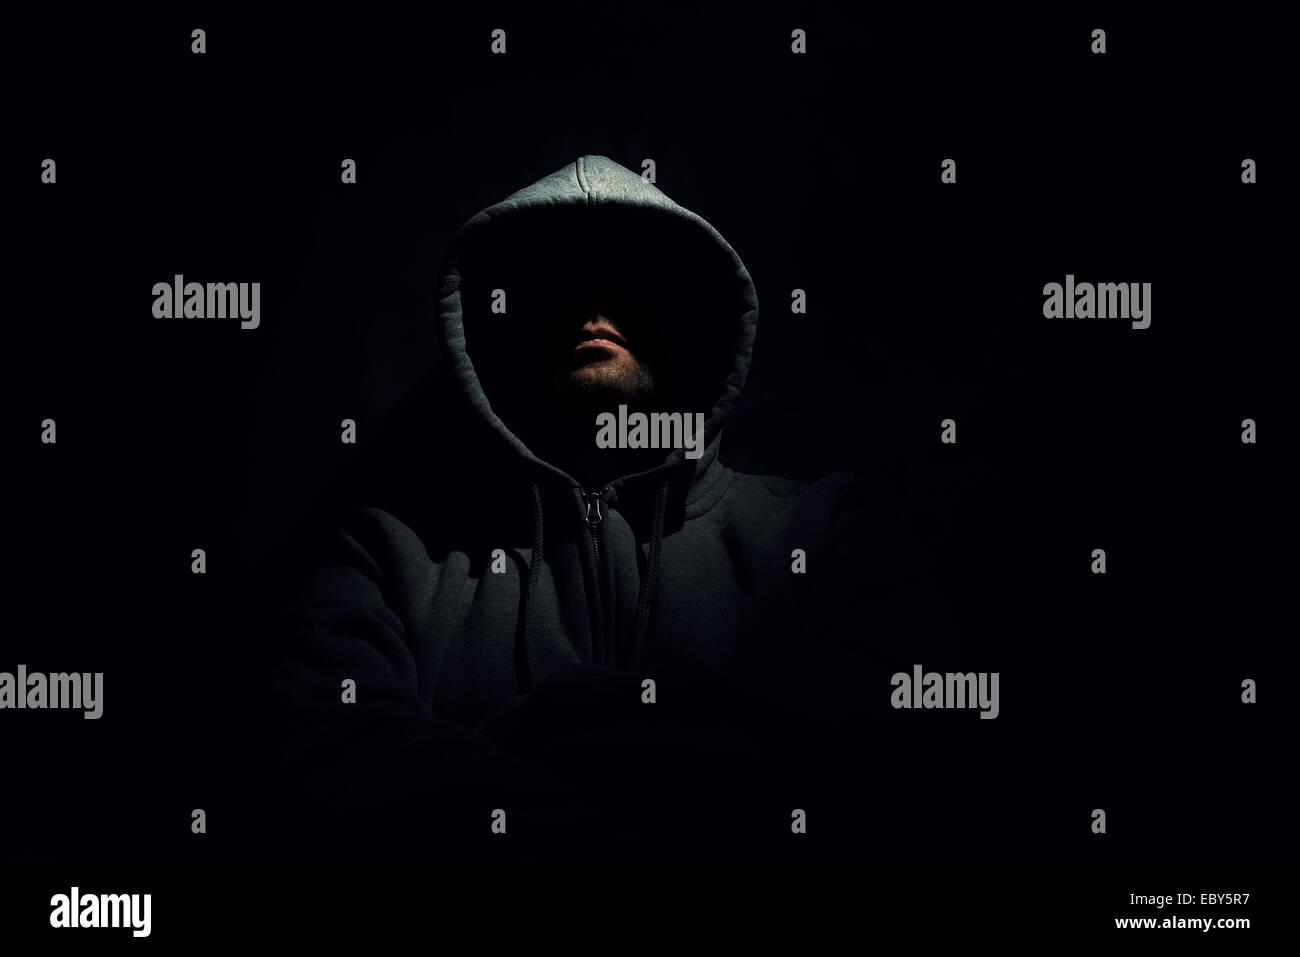 Anonymous man wearing a hoodie sweater in dark surrounding - Stock Image